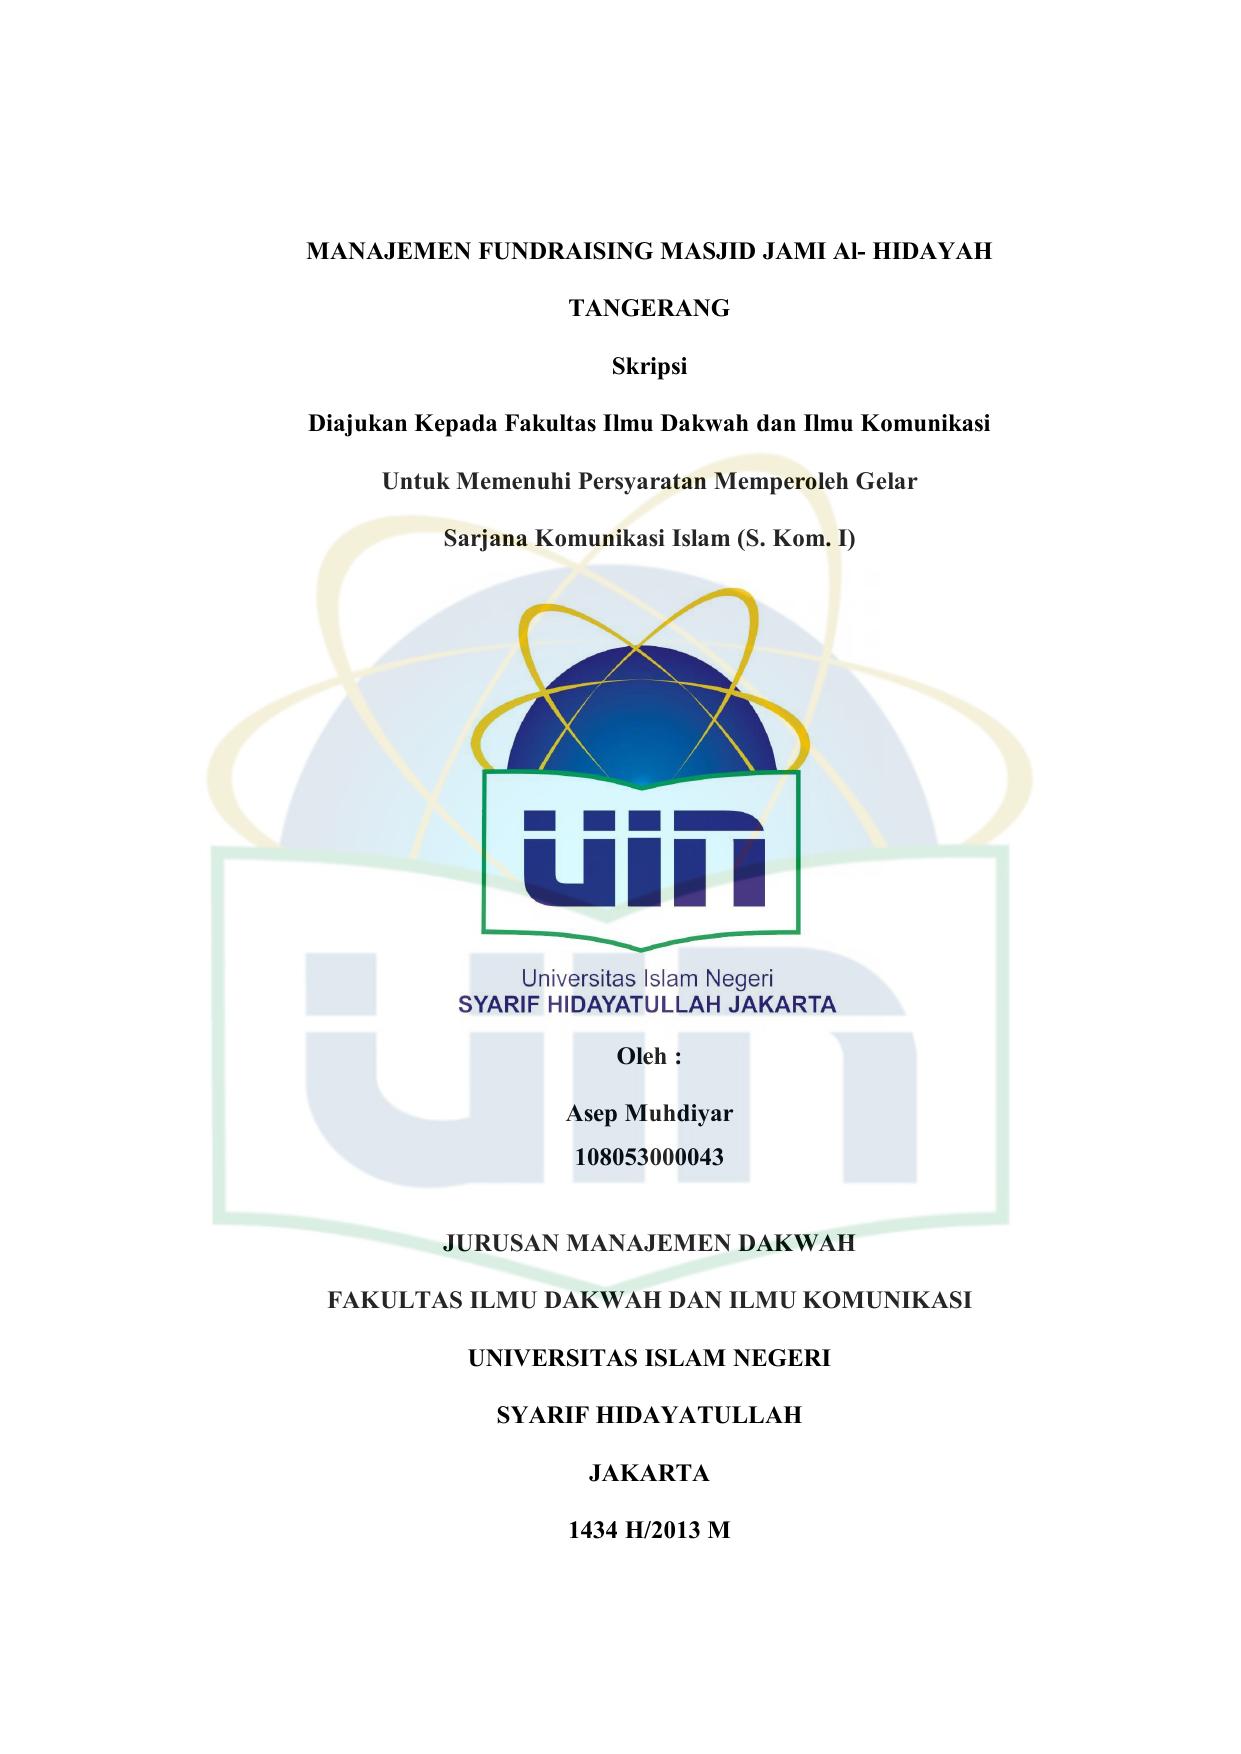 Manajemen Fundraising Masjid Jami Al